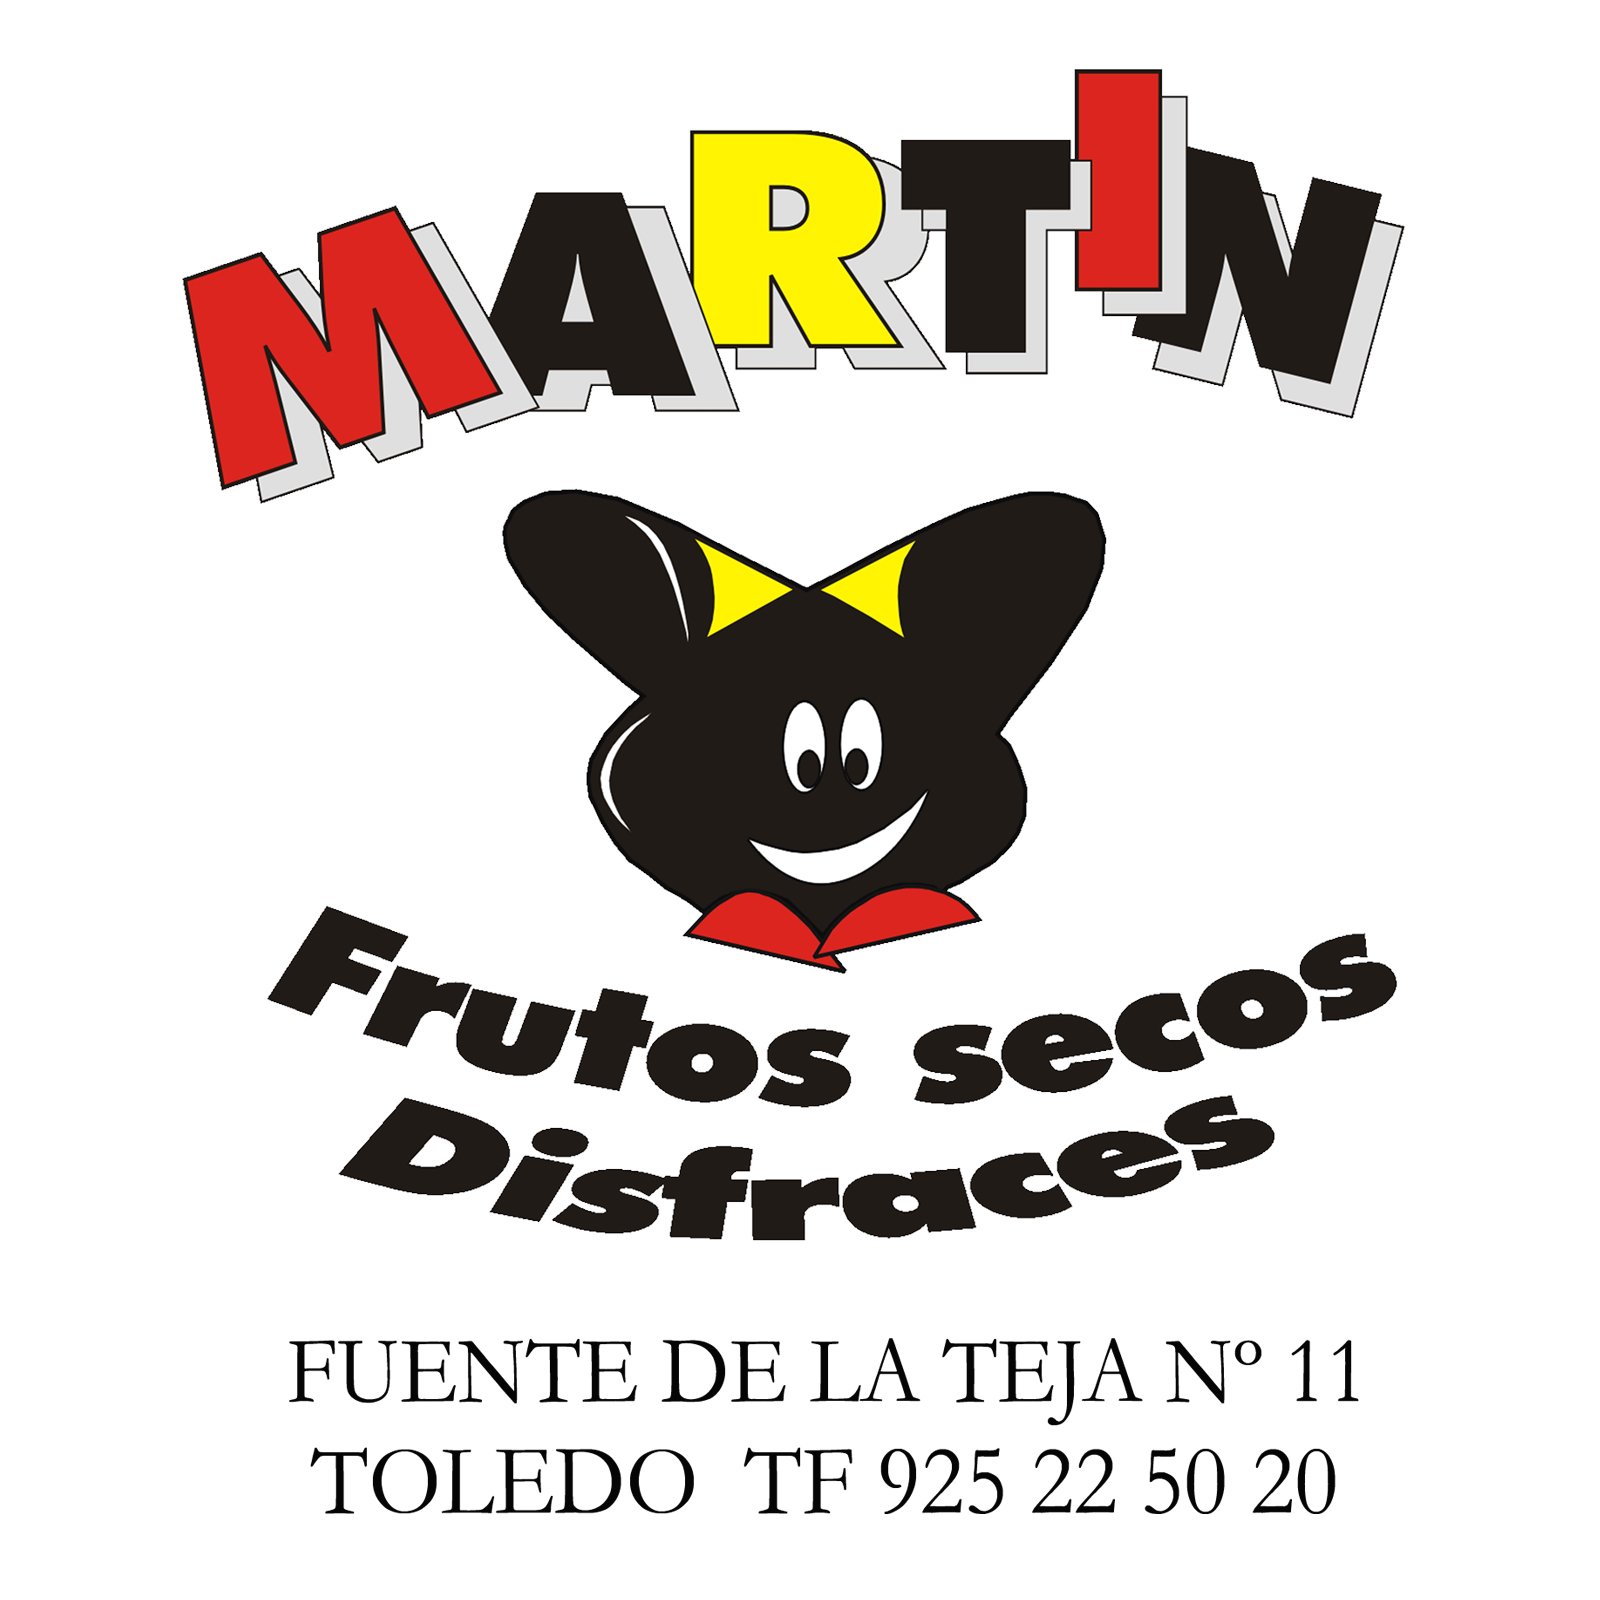 FrutosSecosMartín